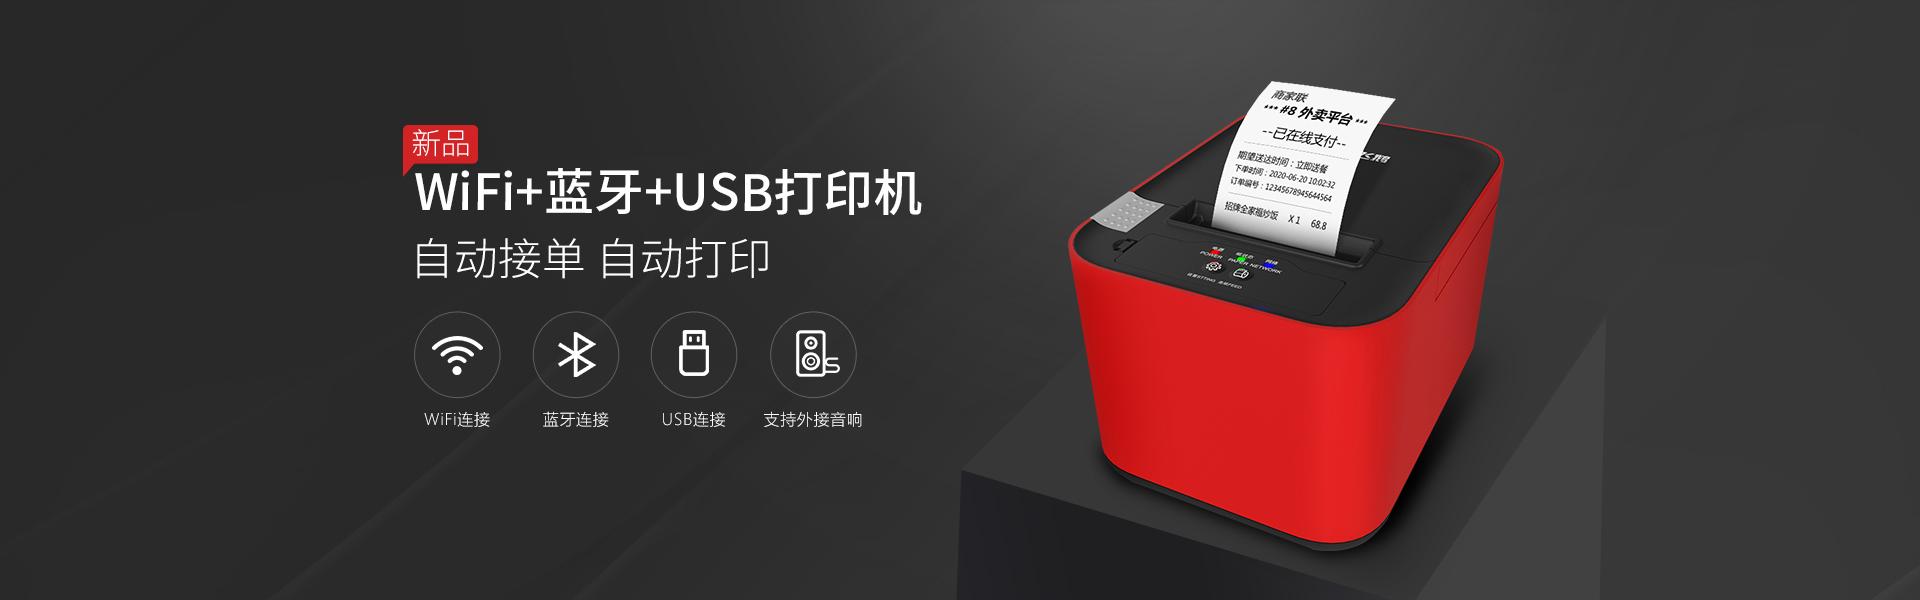 WiFi+蓝牙|--+USB打印机||